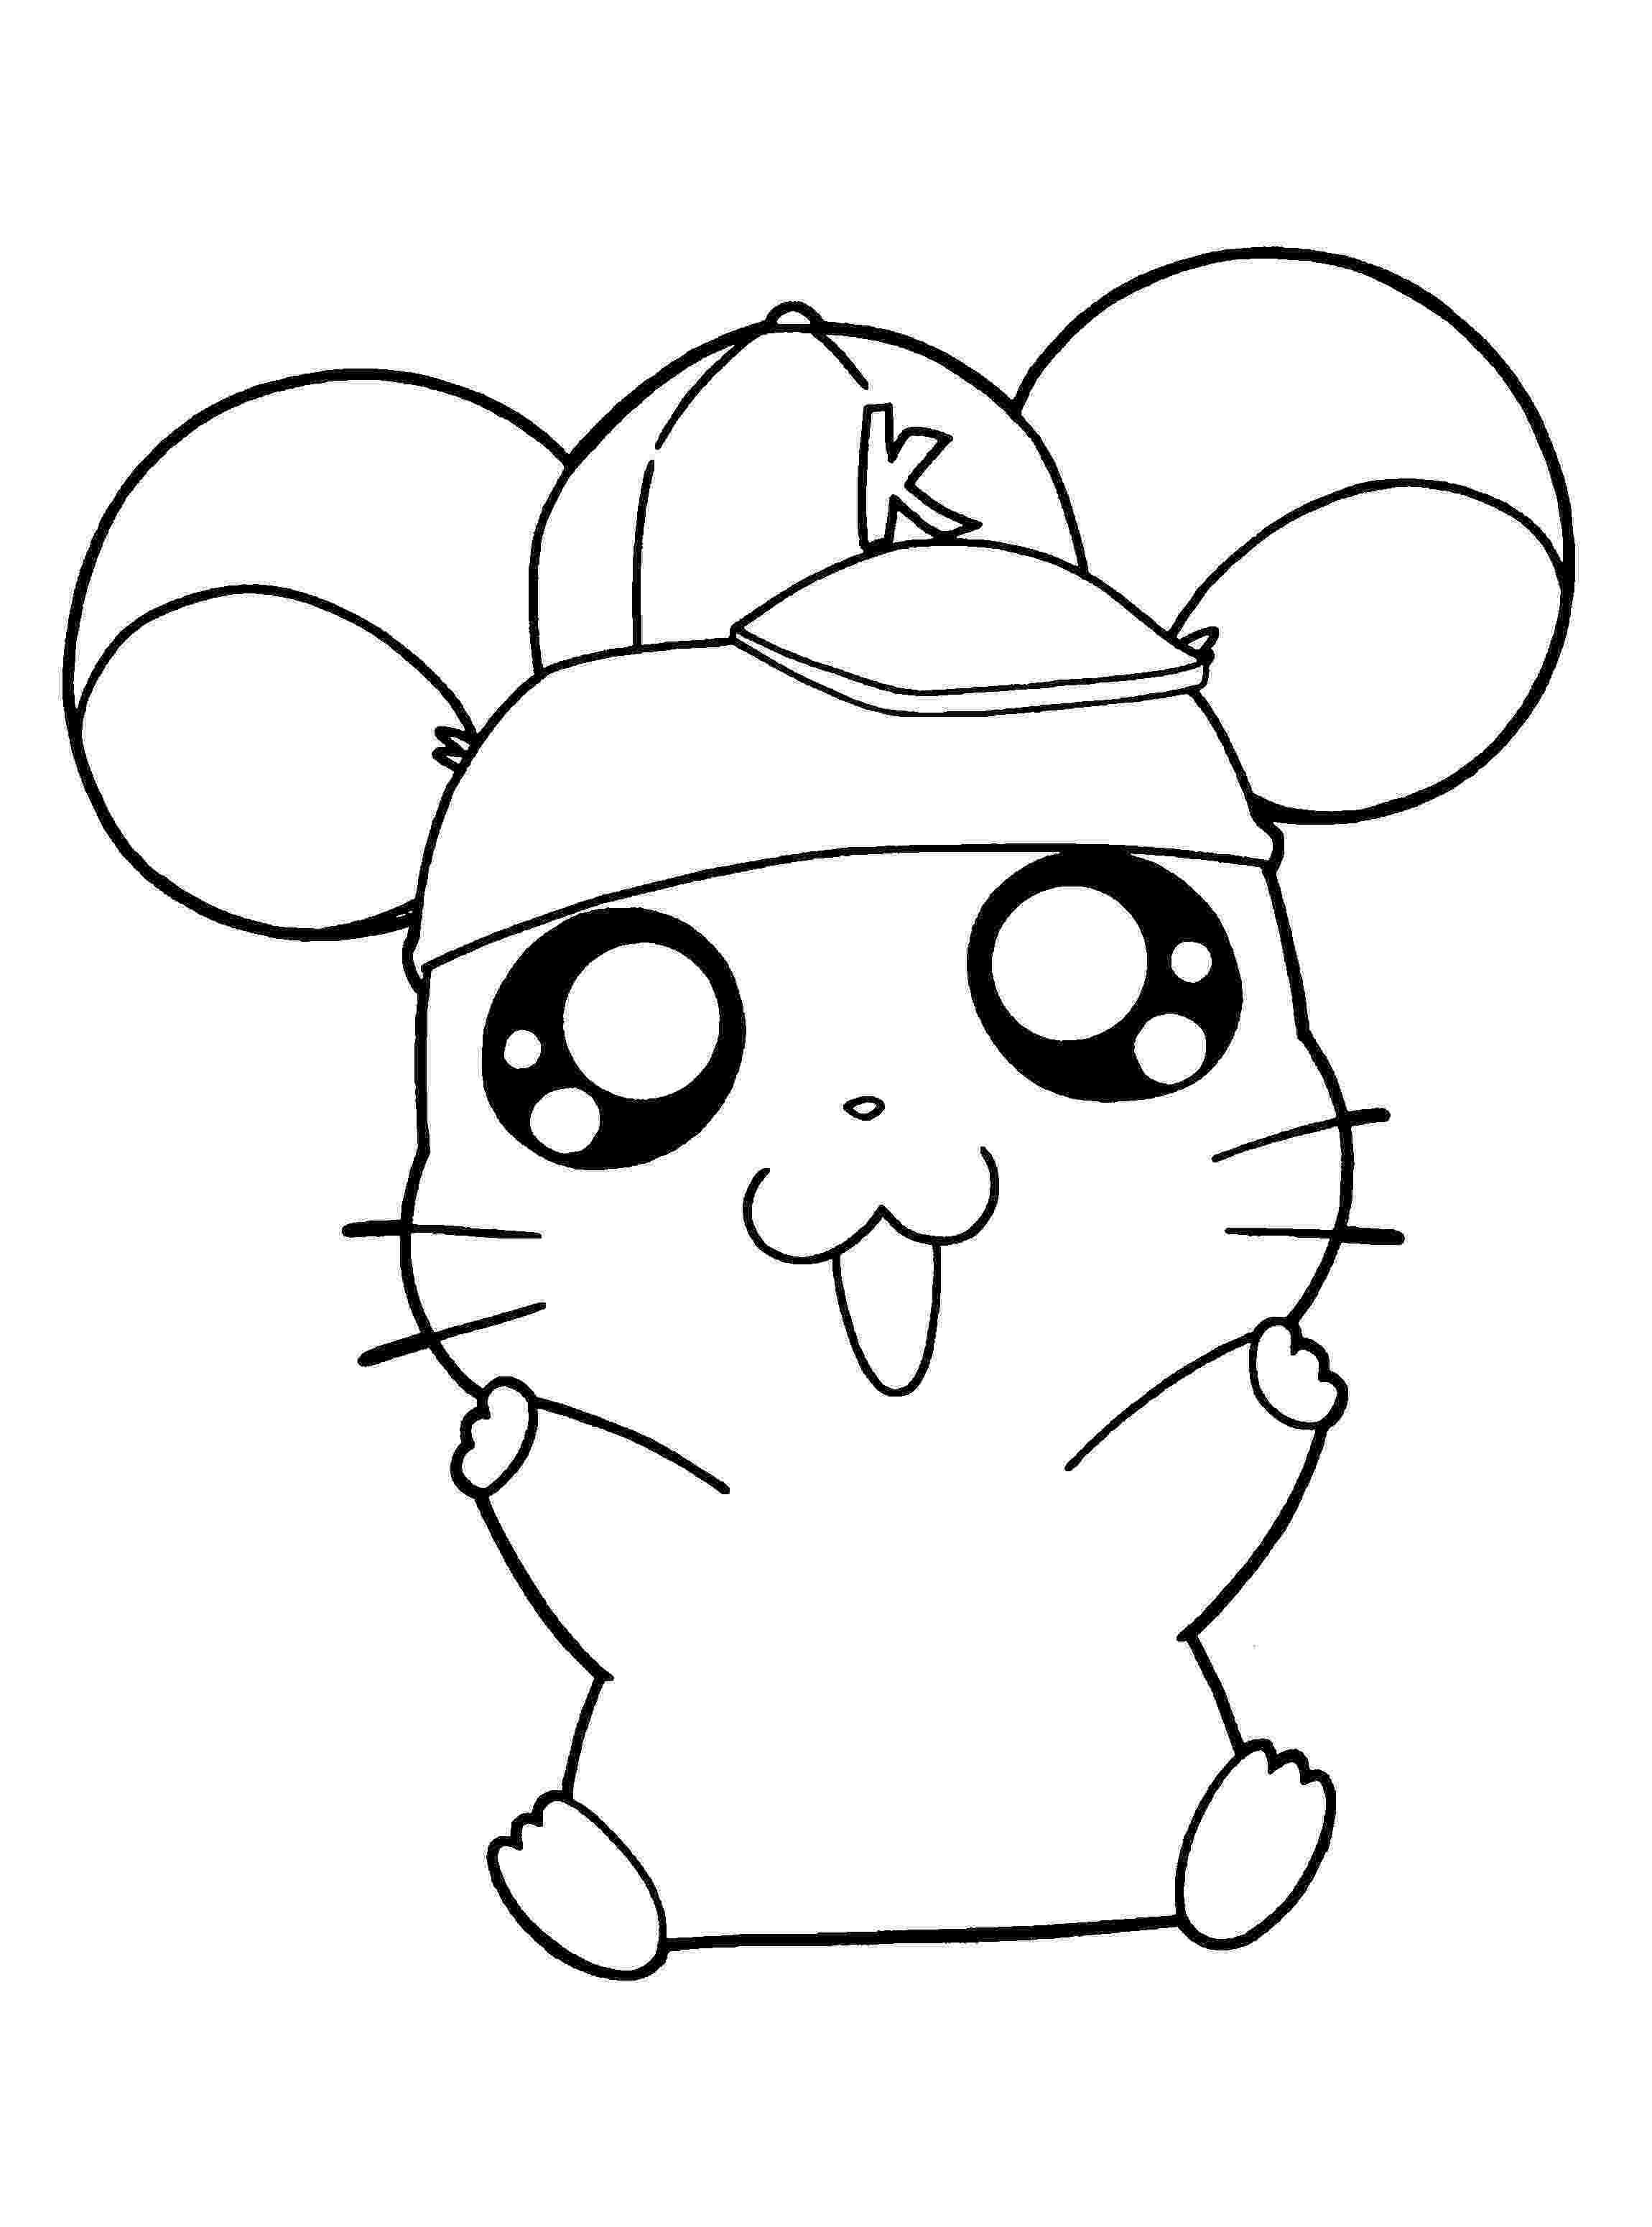 hamster coloring page hamster coloring pages best coloring pages for kids hamster page coloring